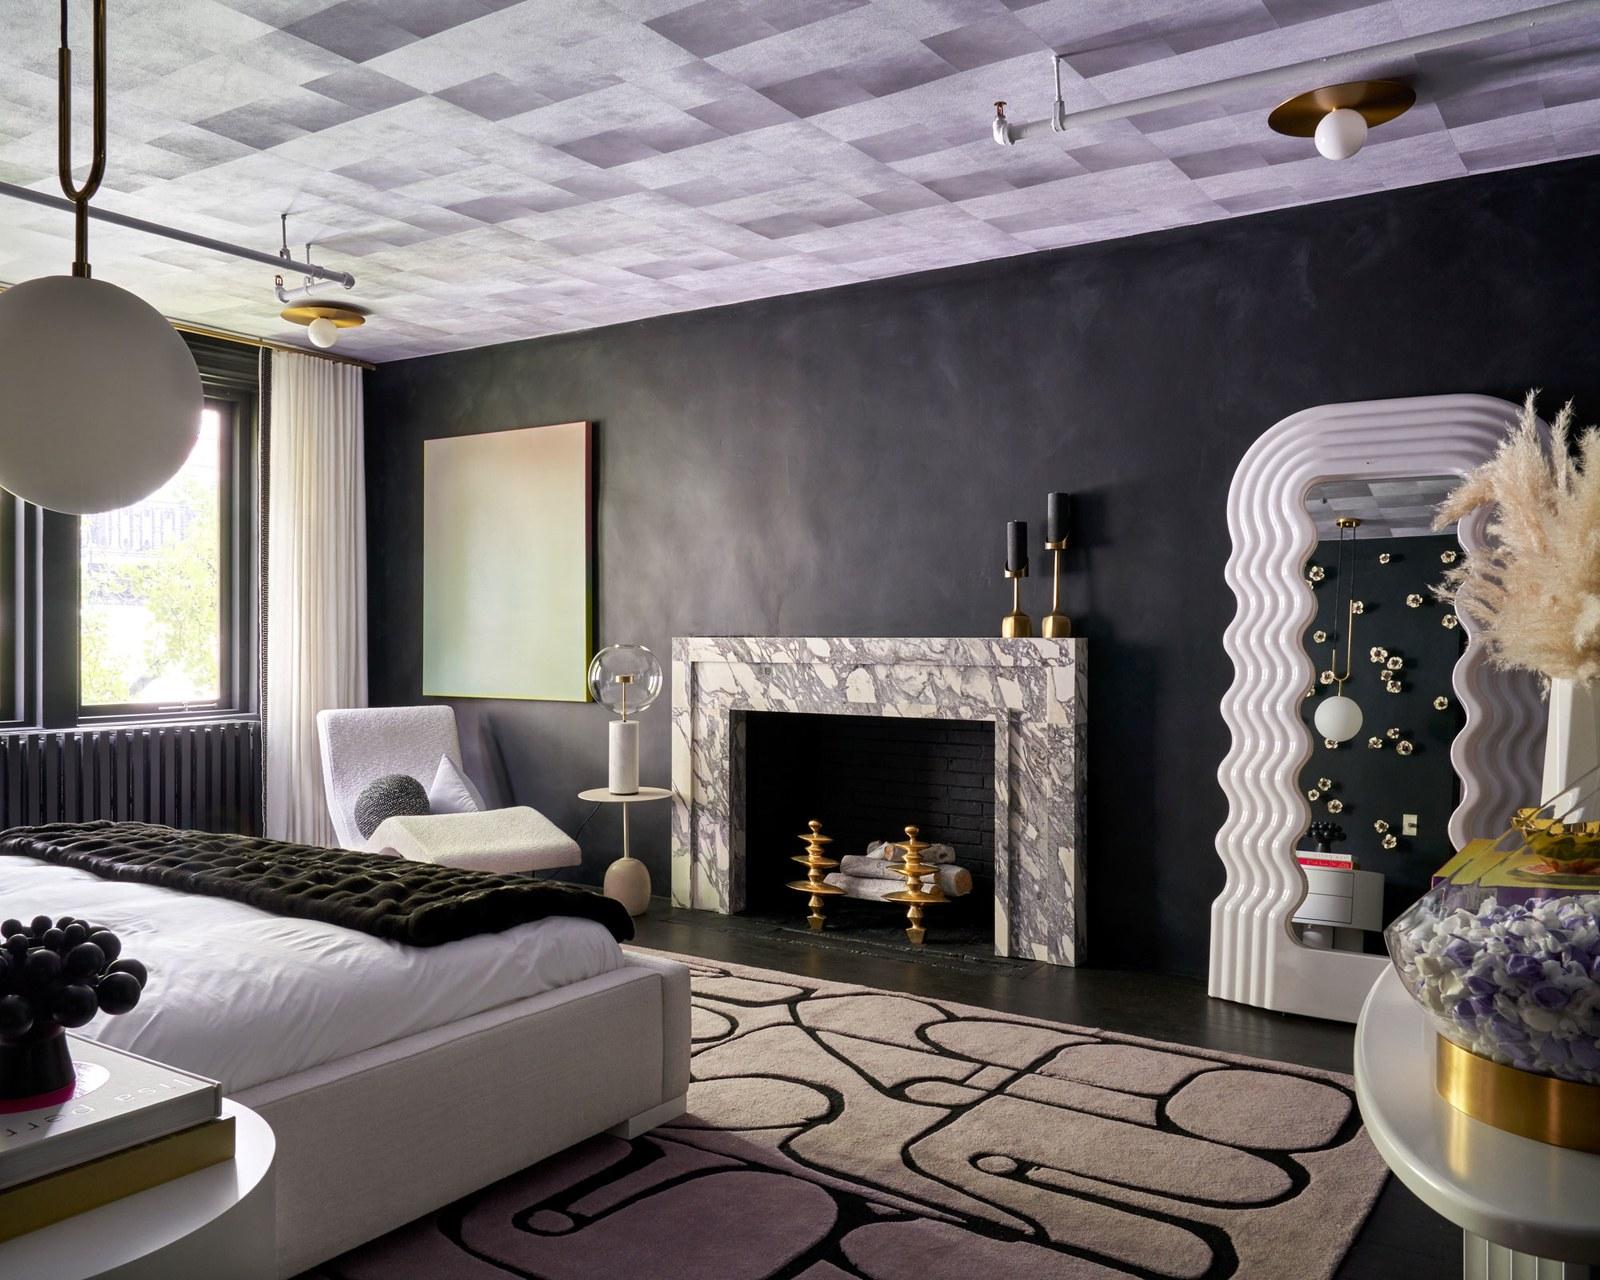 Step Inside Holiday House's Spectacular Designer Rooms